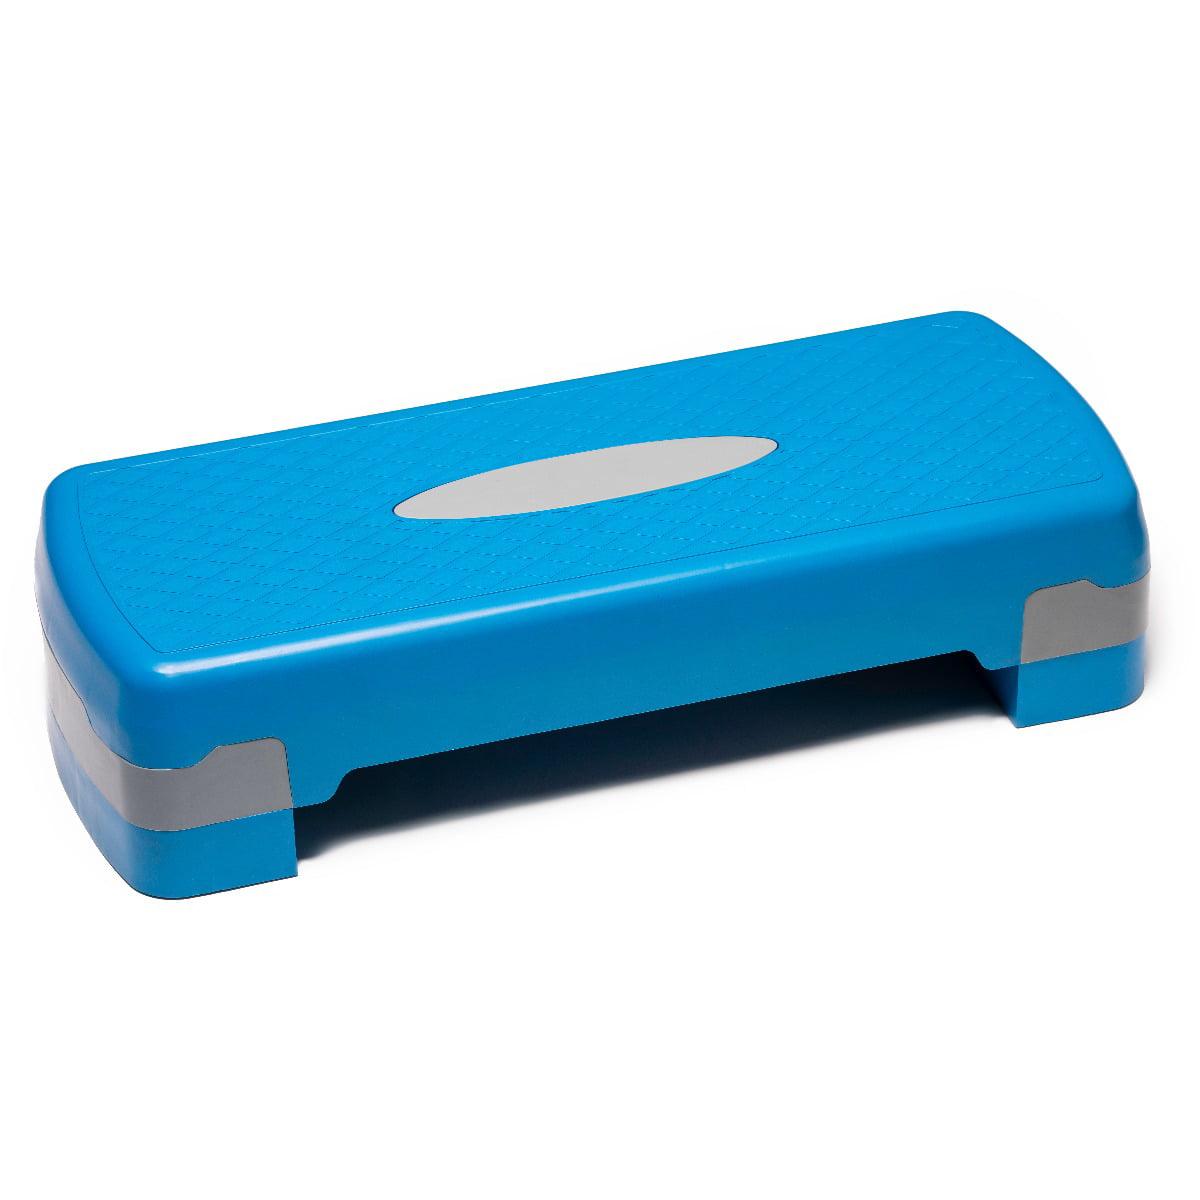 ~Yoga Step Up Cardio Gym Master Adjustable Aerobic Stepper Home Exercise Board